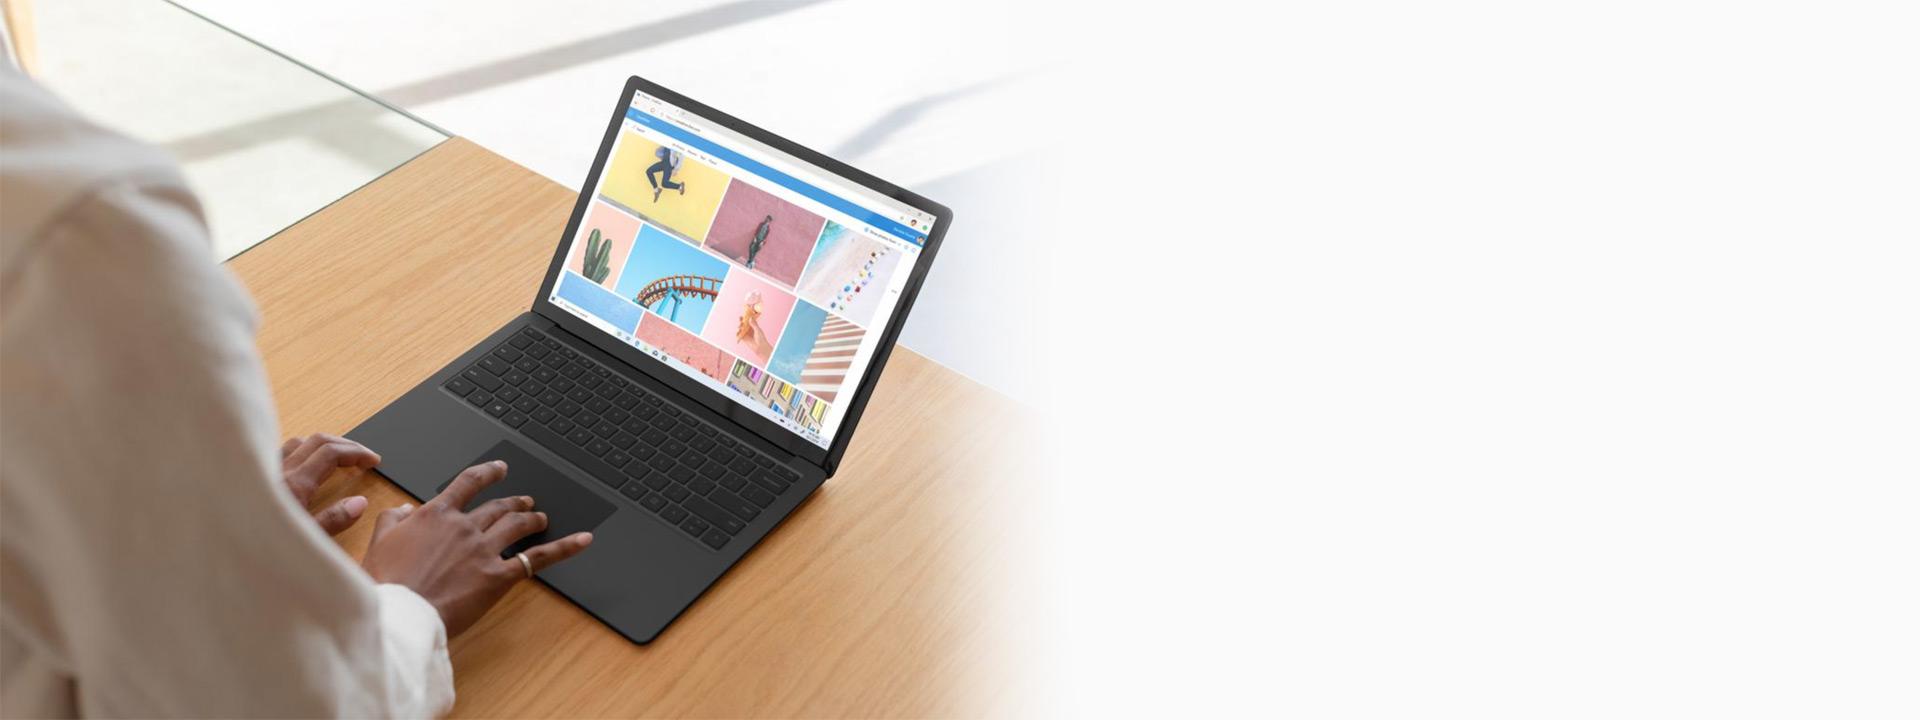 Surface Laptop 3 in Black